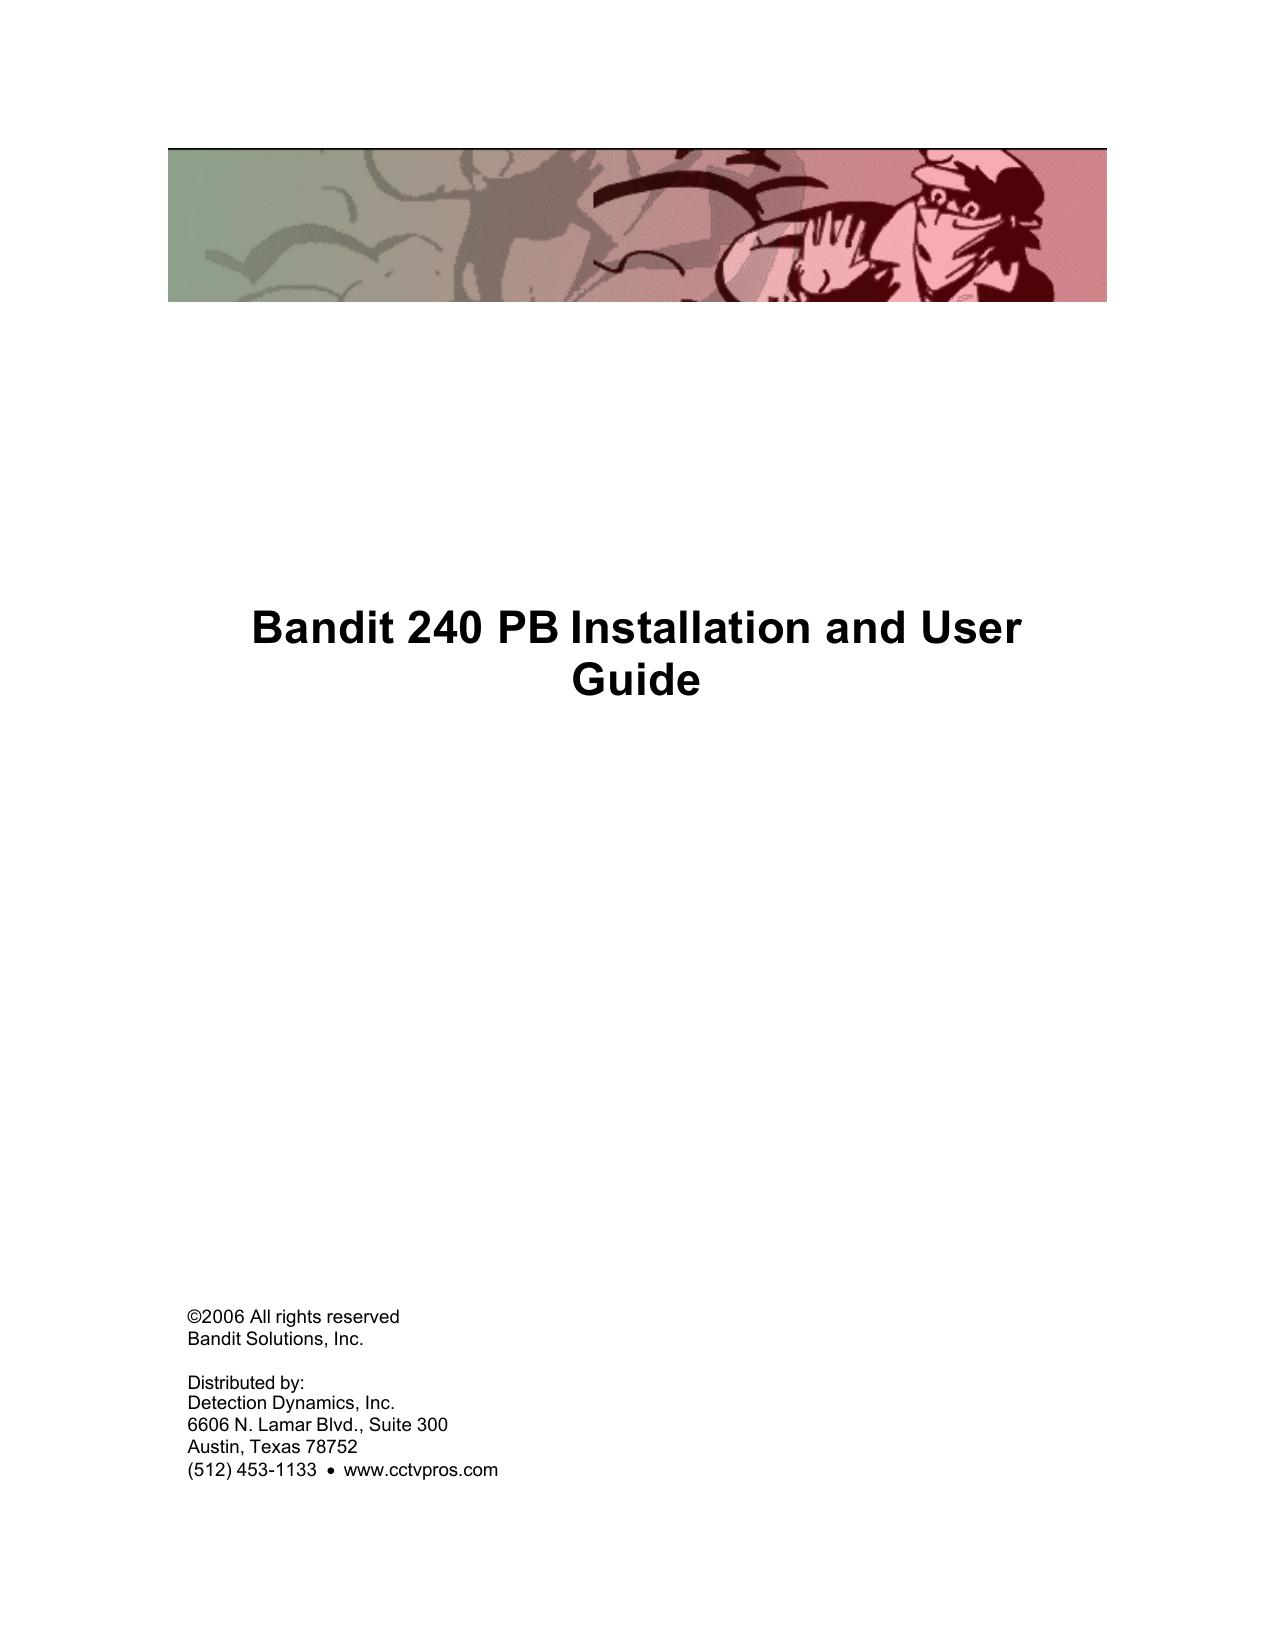 Fog bandit manual.